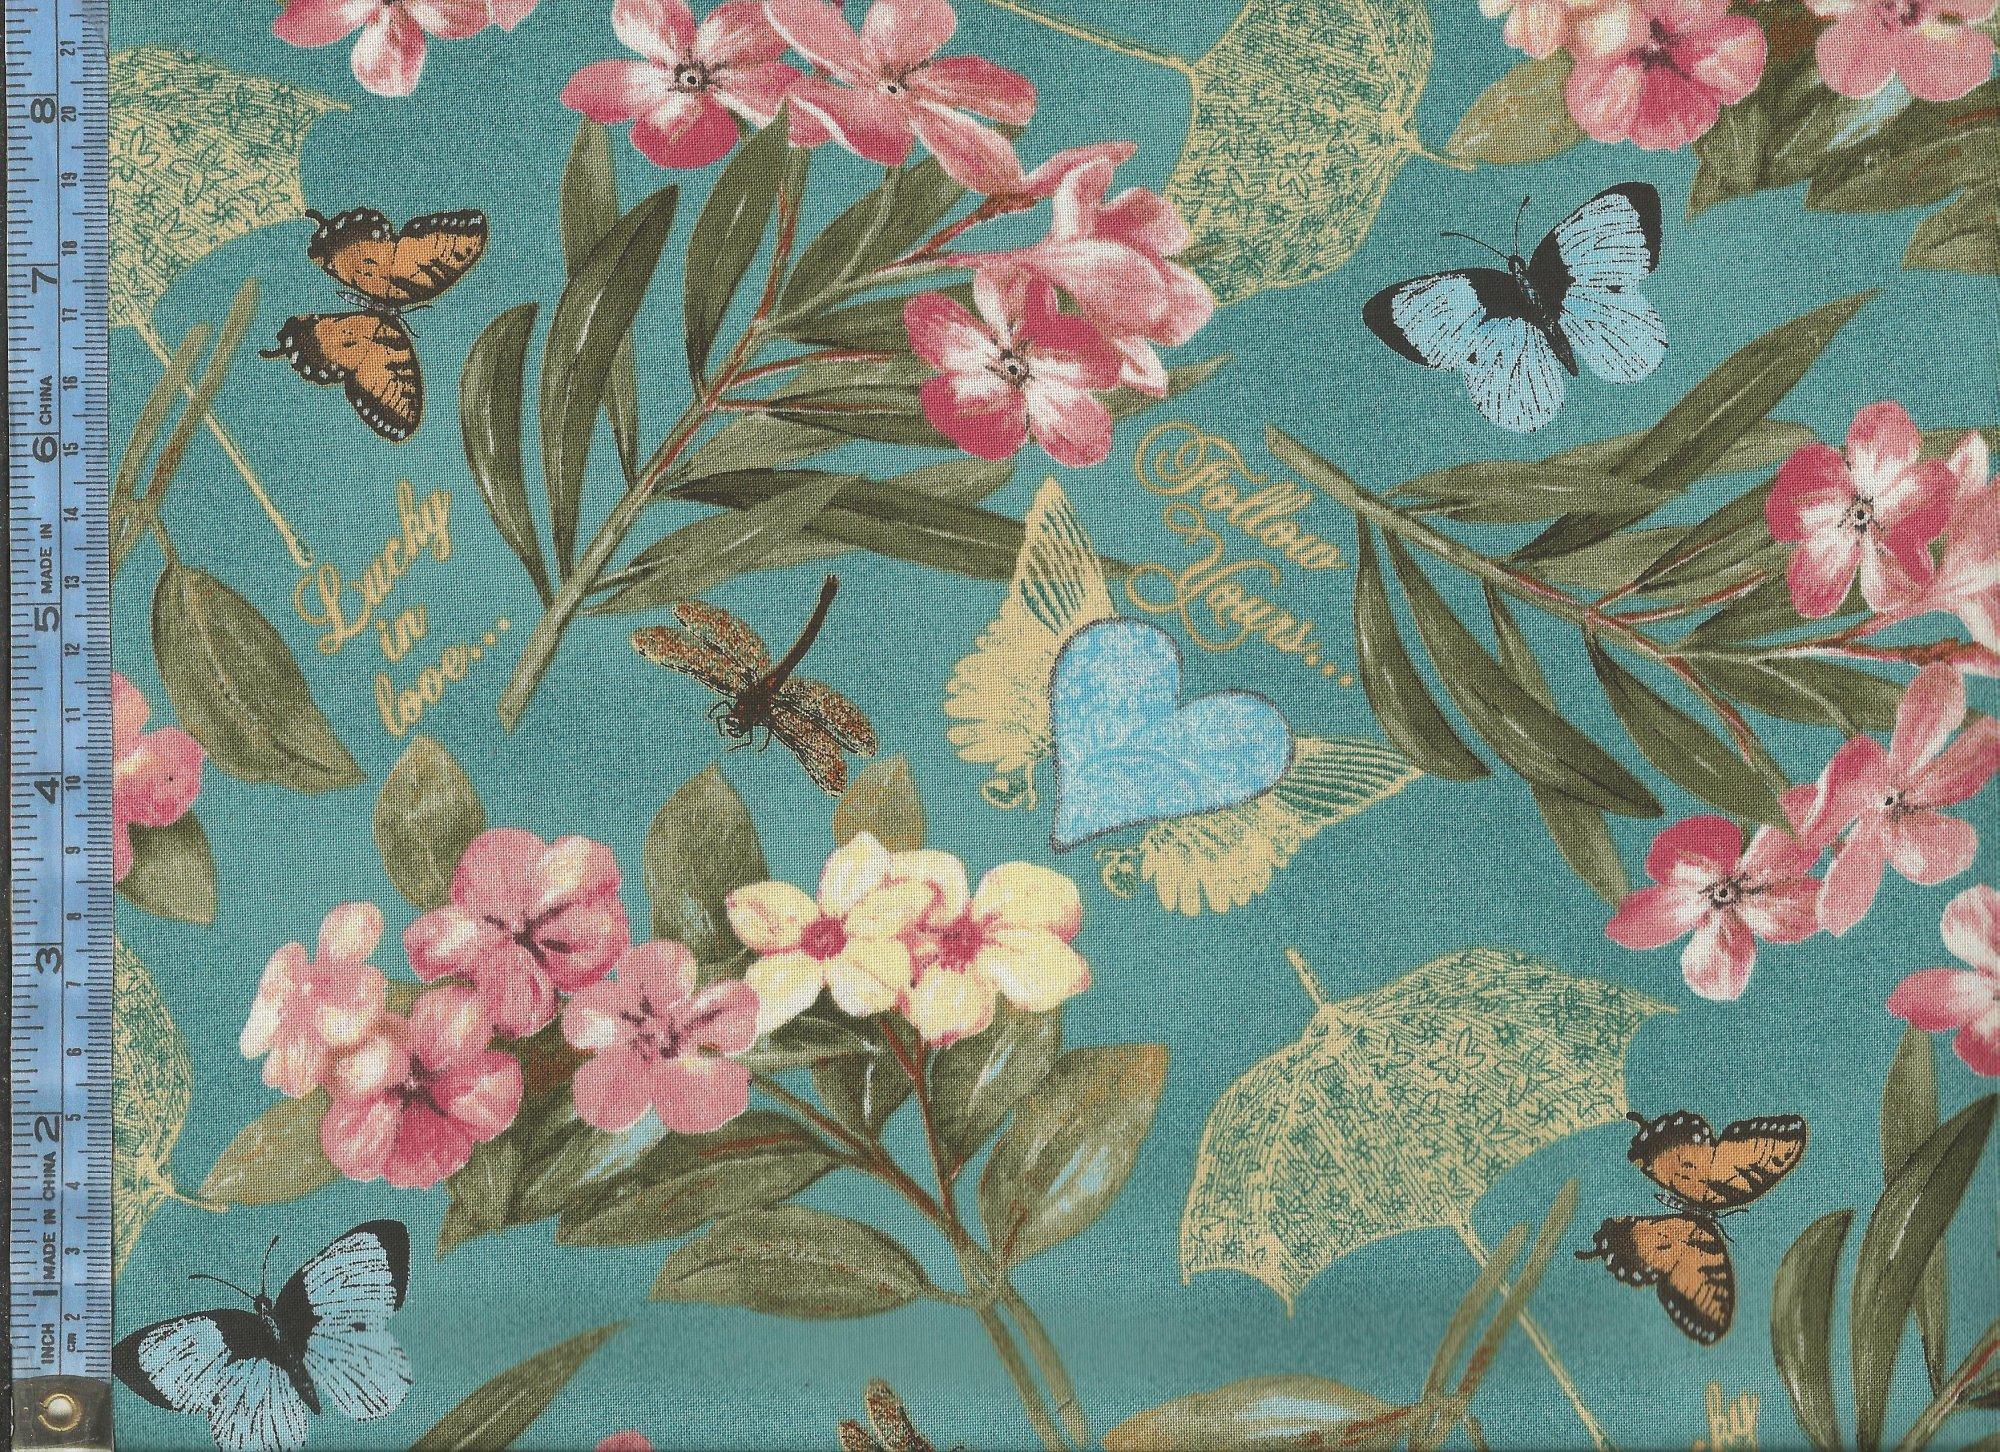 Garden Hideaway Pink Flowers With Light Blue Butterflies And Beige